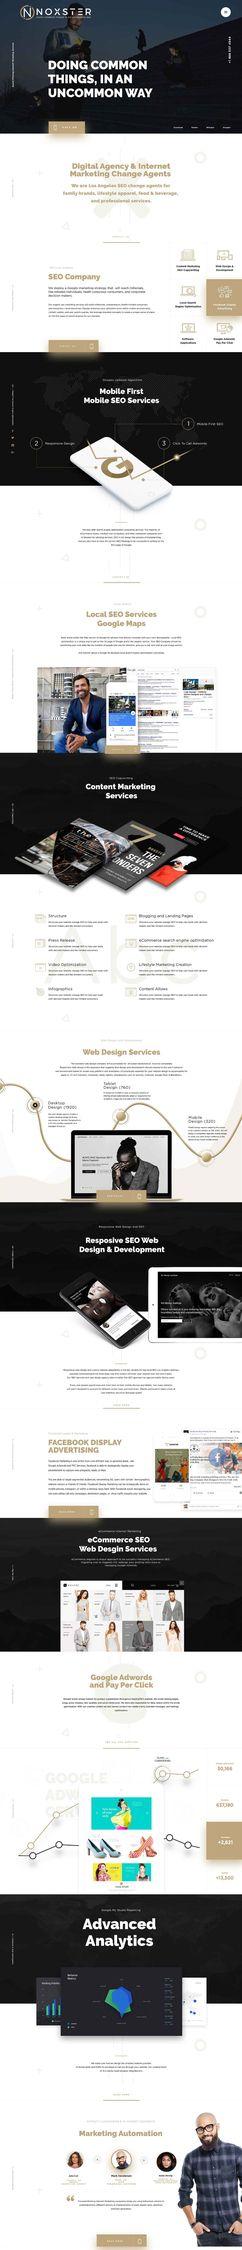 Noxster Web Development Divi wo - ainal_me | ello